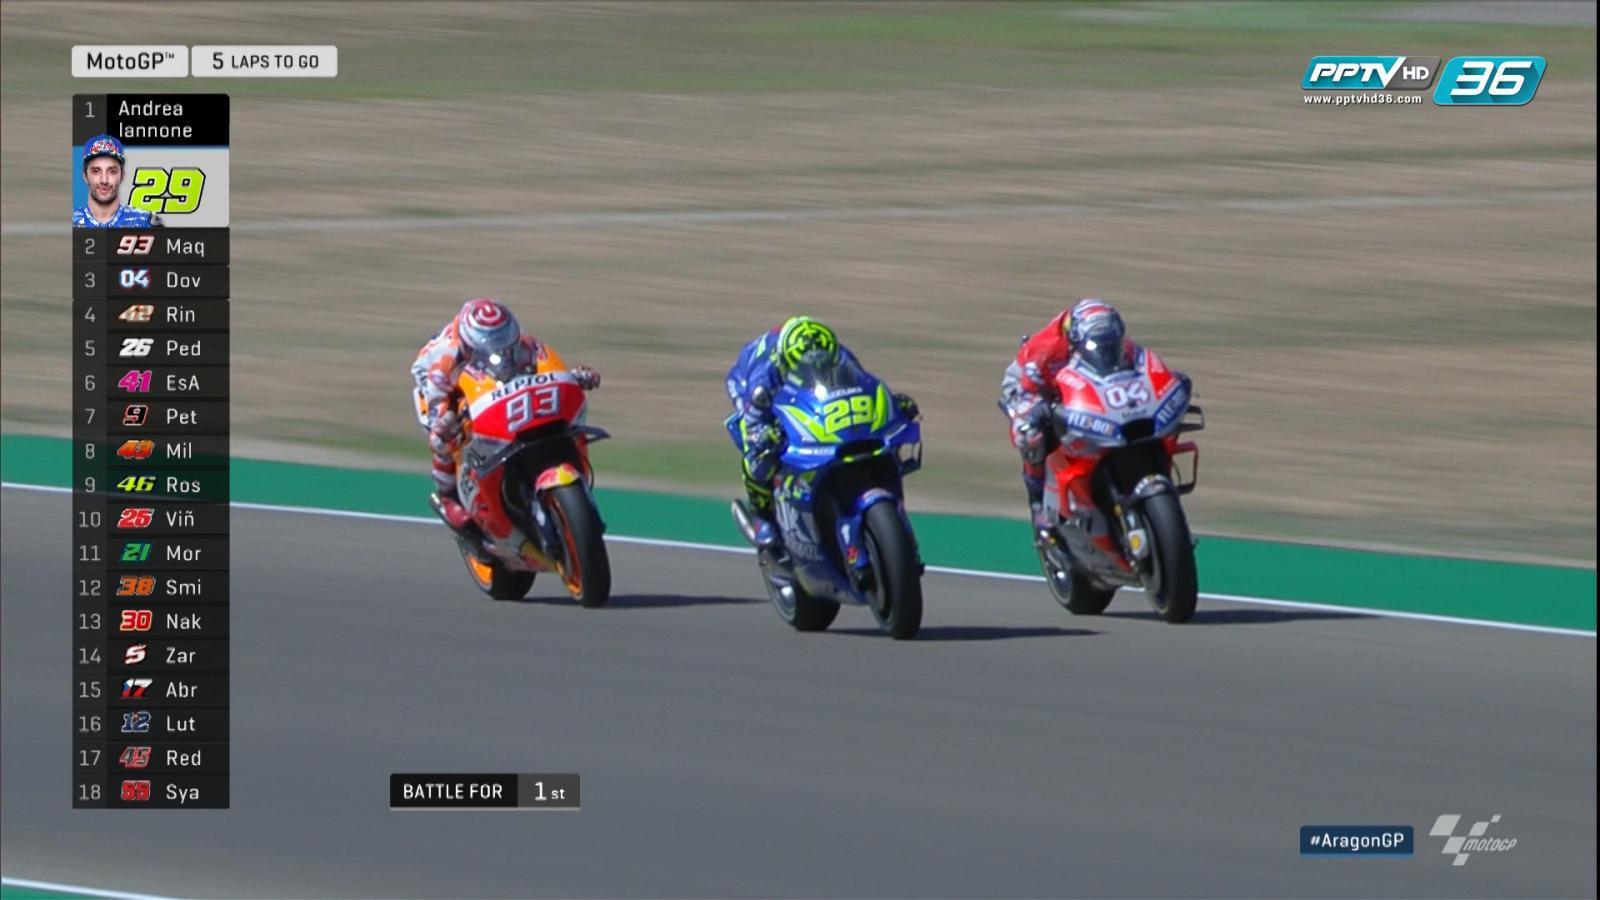 Márquez, Dovizioso และ Iannone ต่างช่วงชิงจังหวะเเซงขึ้นเป็นที่ 1